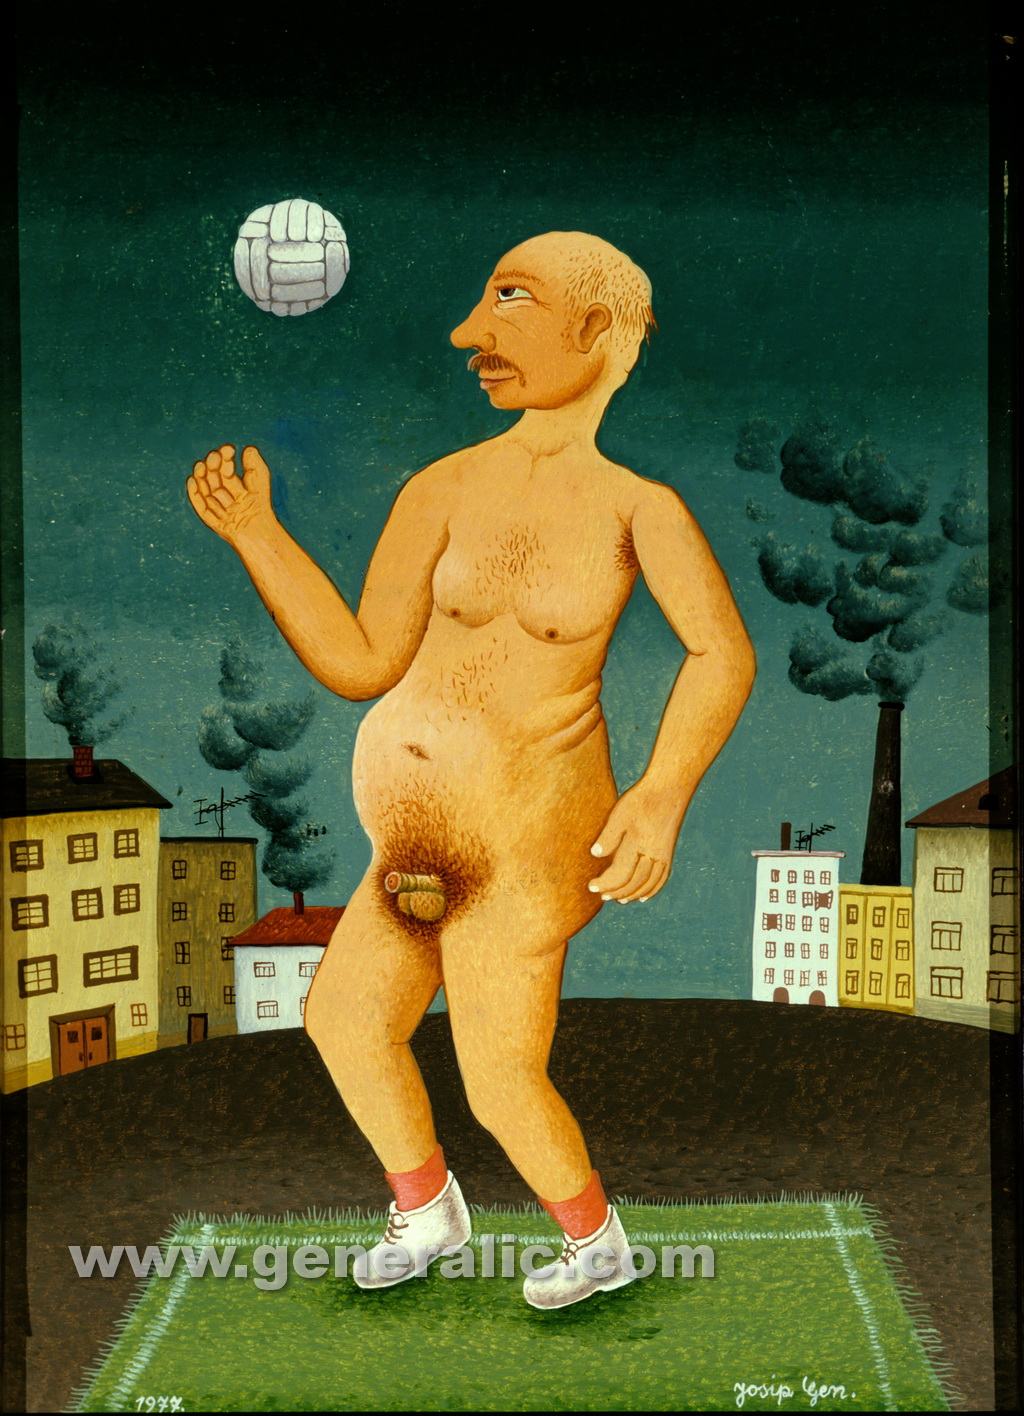 Josip Generalic, 1977, Morning practice, oi l on canvas